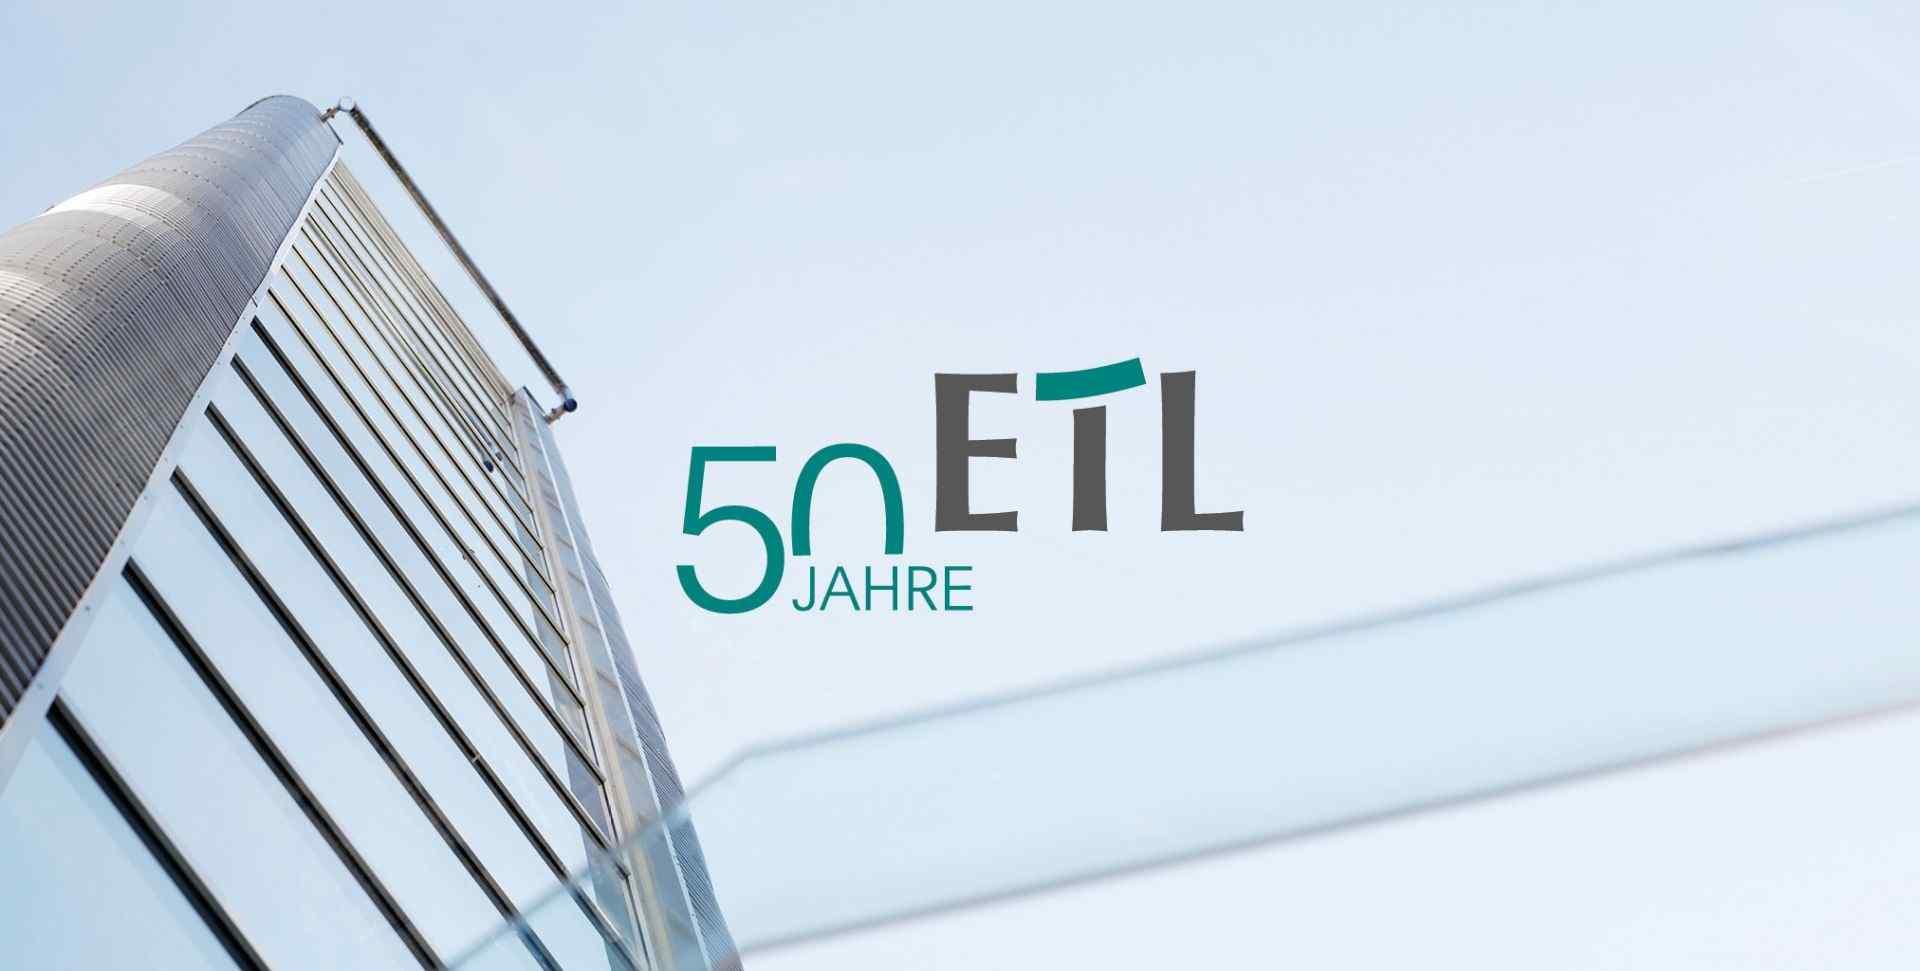 ETL-Gruppe, Jubiläum: ETL wird 50